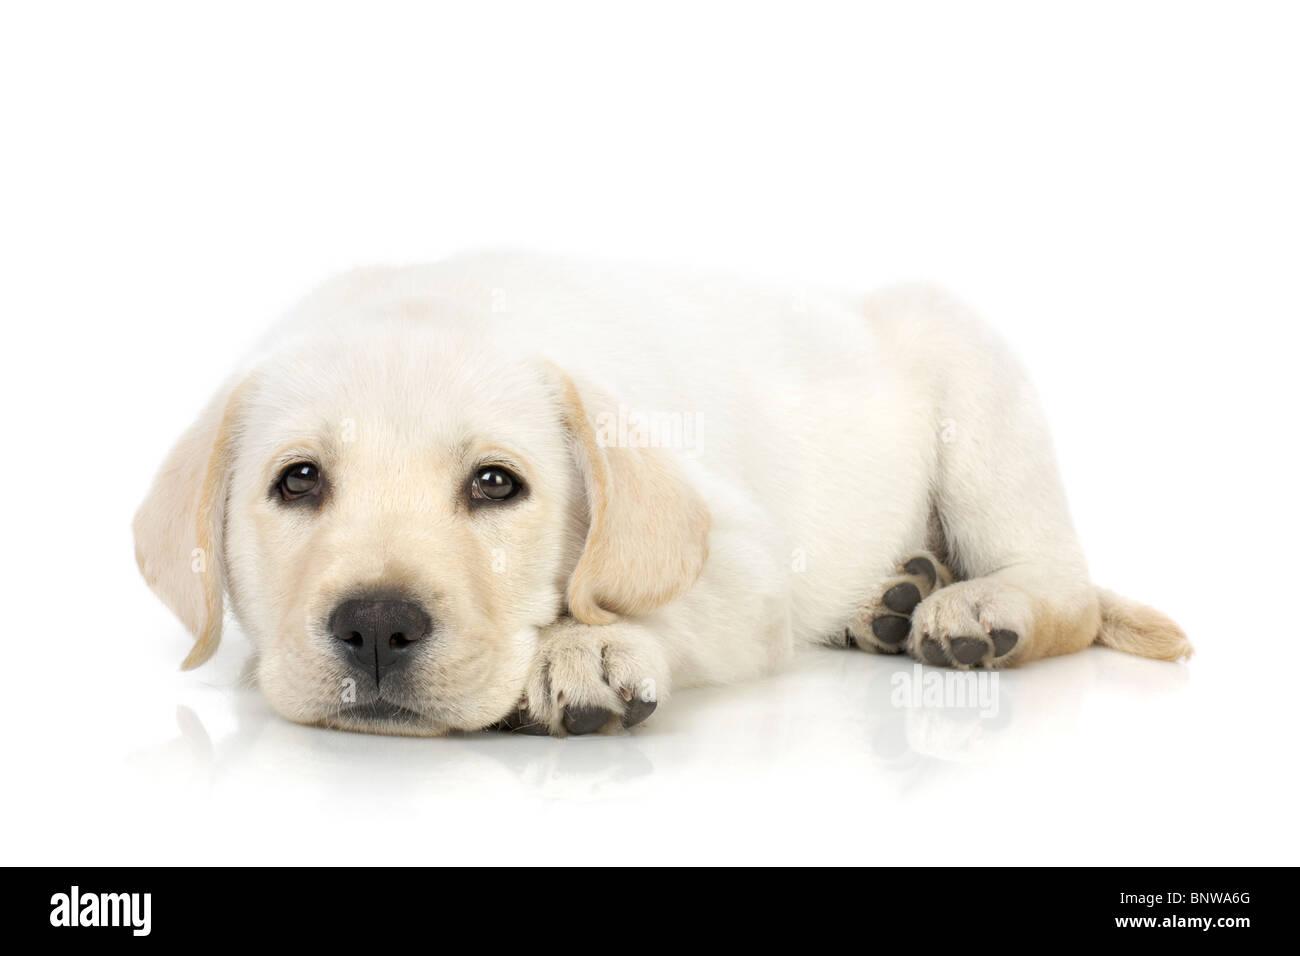 Adorable Labrador retriever puppy against white background - Stock Image